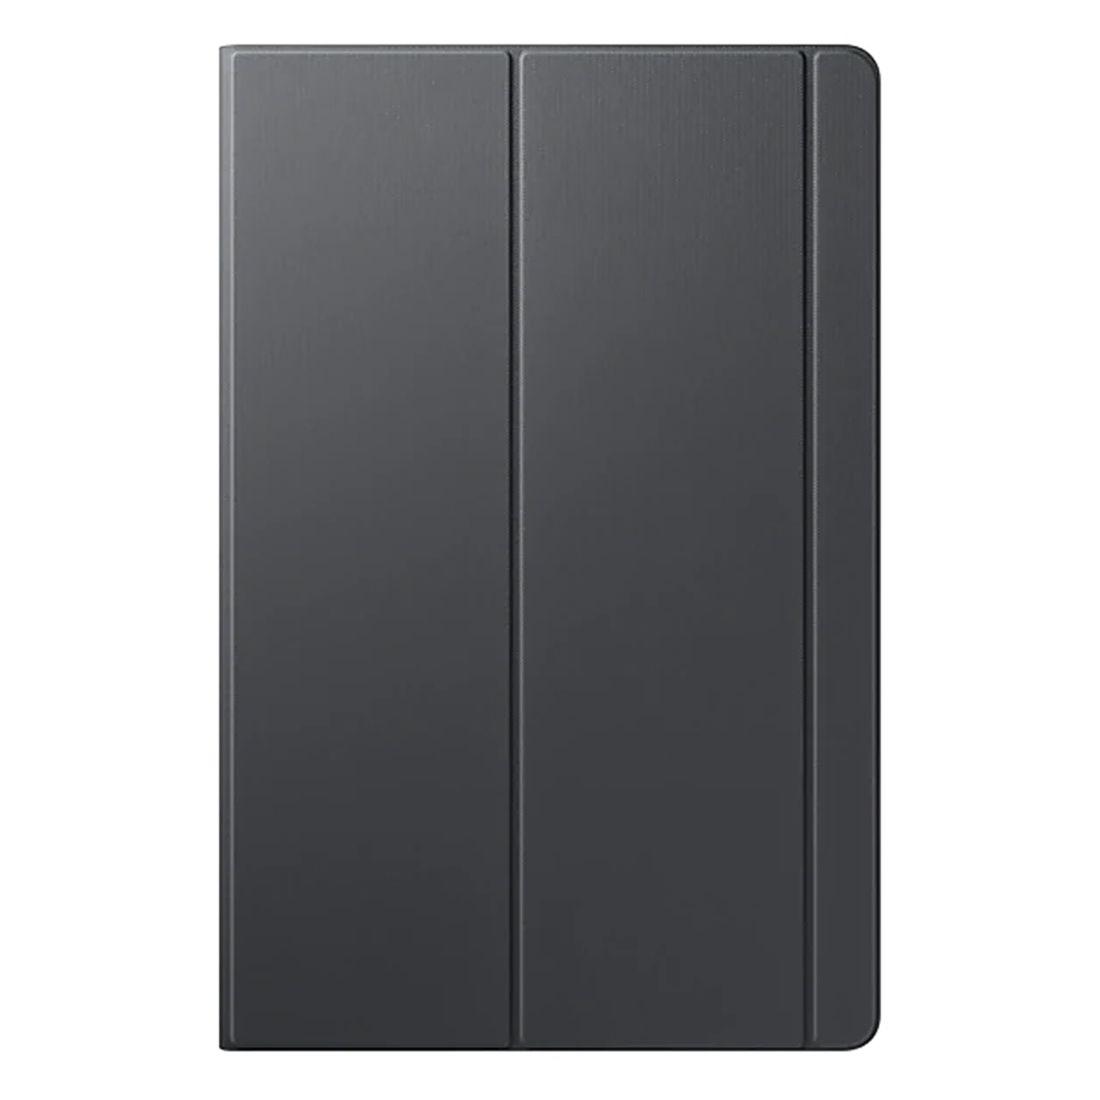 Samsung Galaxy Tab S6 10.5 Book Cover - Grey